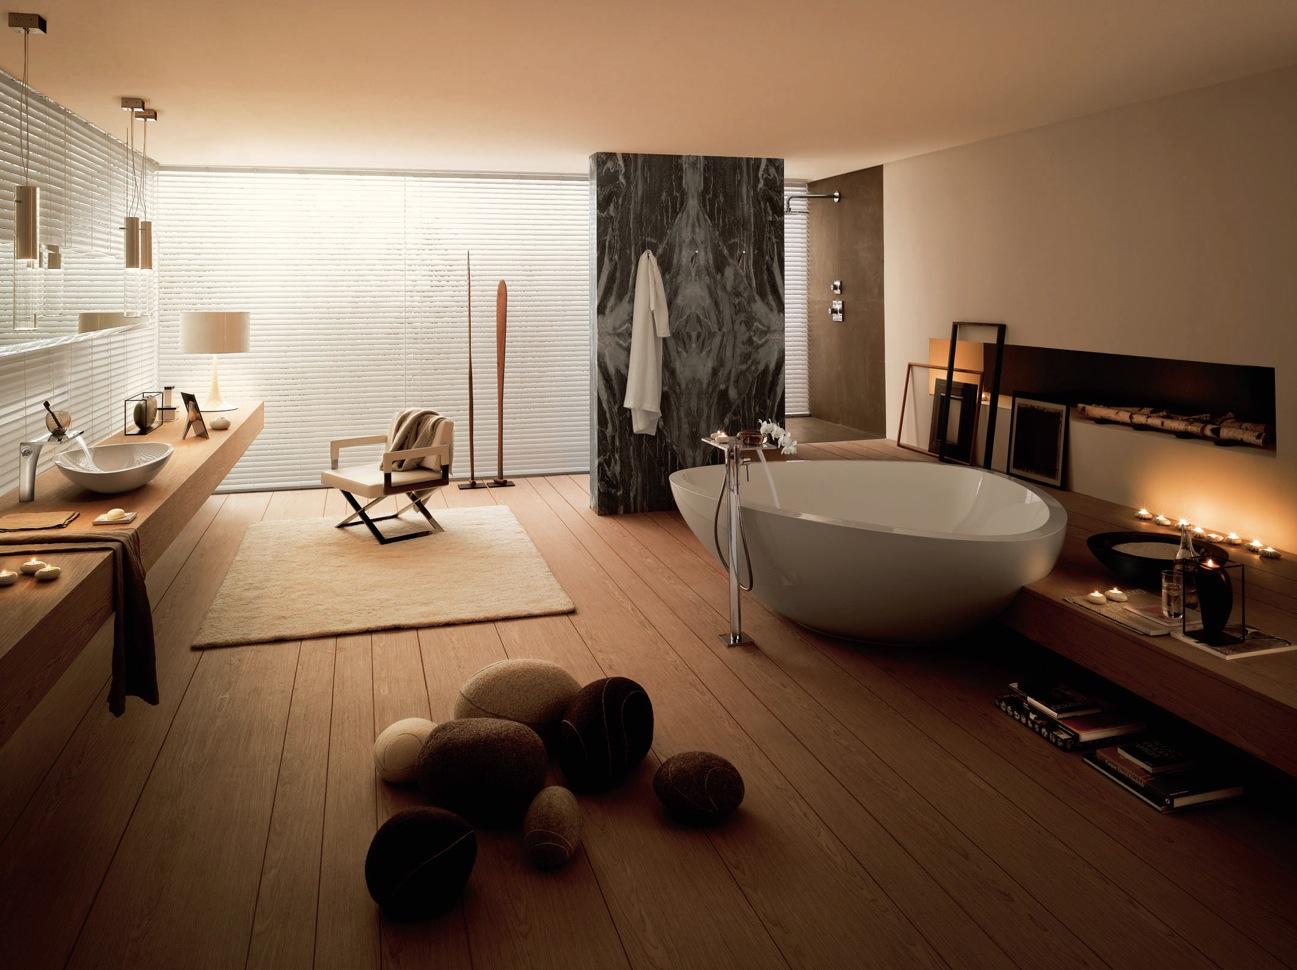 Bathroom-Design-with-Modern-Bath-Tub-Little-Stone-Chair-Fur-Carpet-Art-Door-Unique-Lamp-Laminated-Long-Table-and-Floor